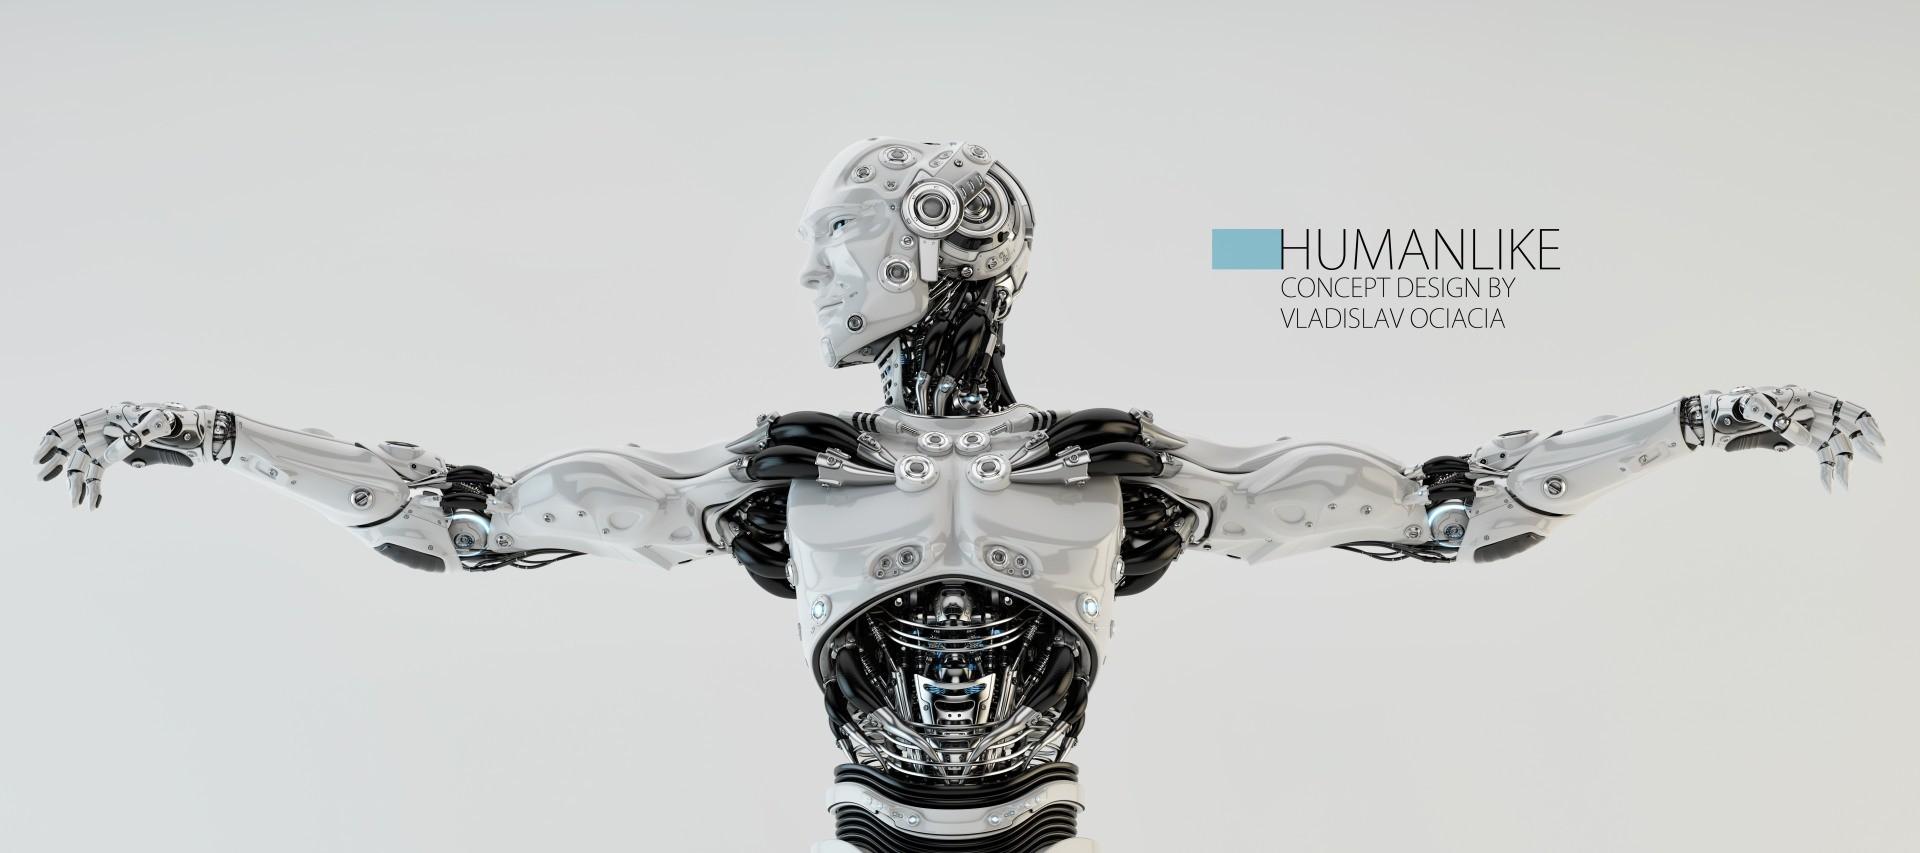 Vladislav ociacia robot humanlike 2